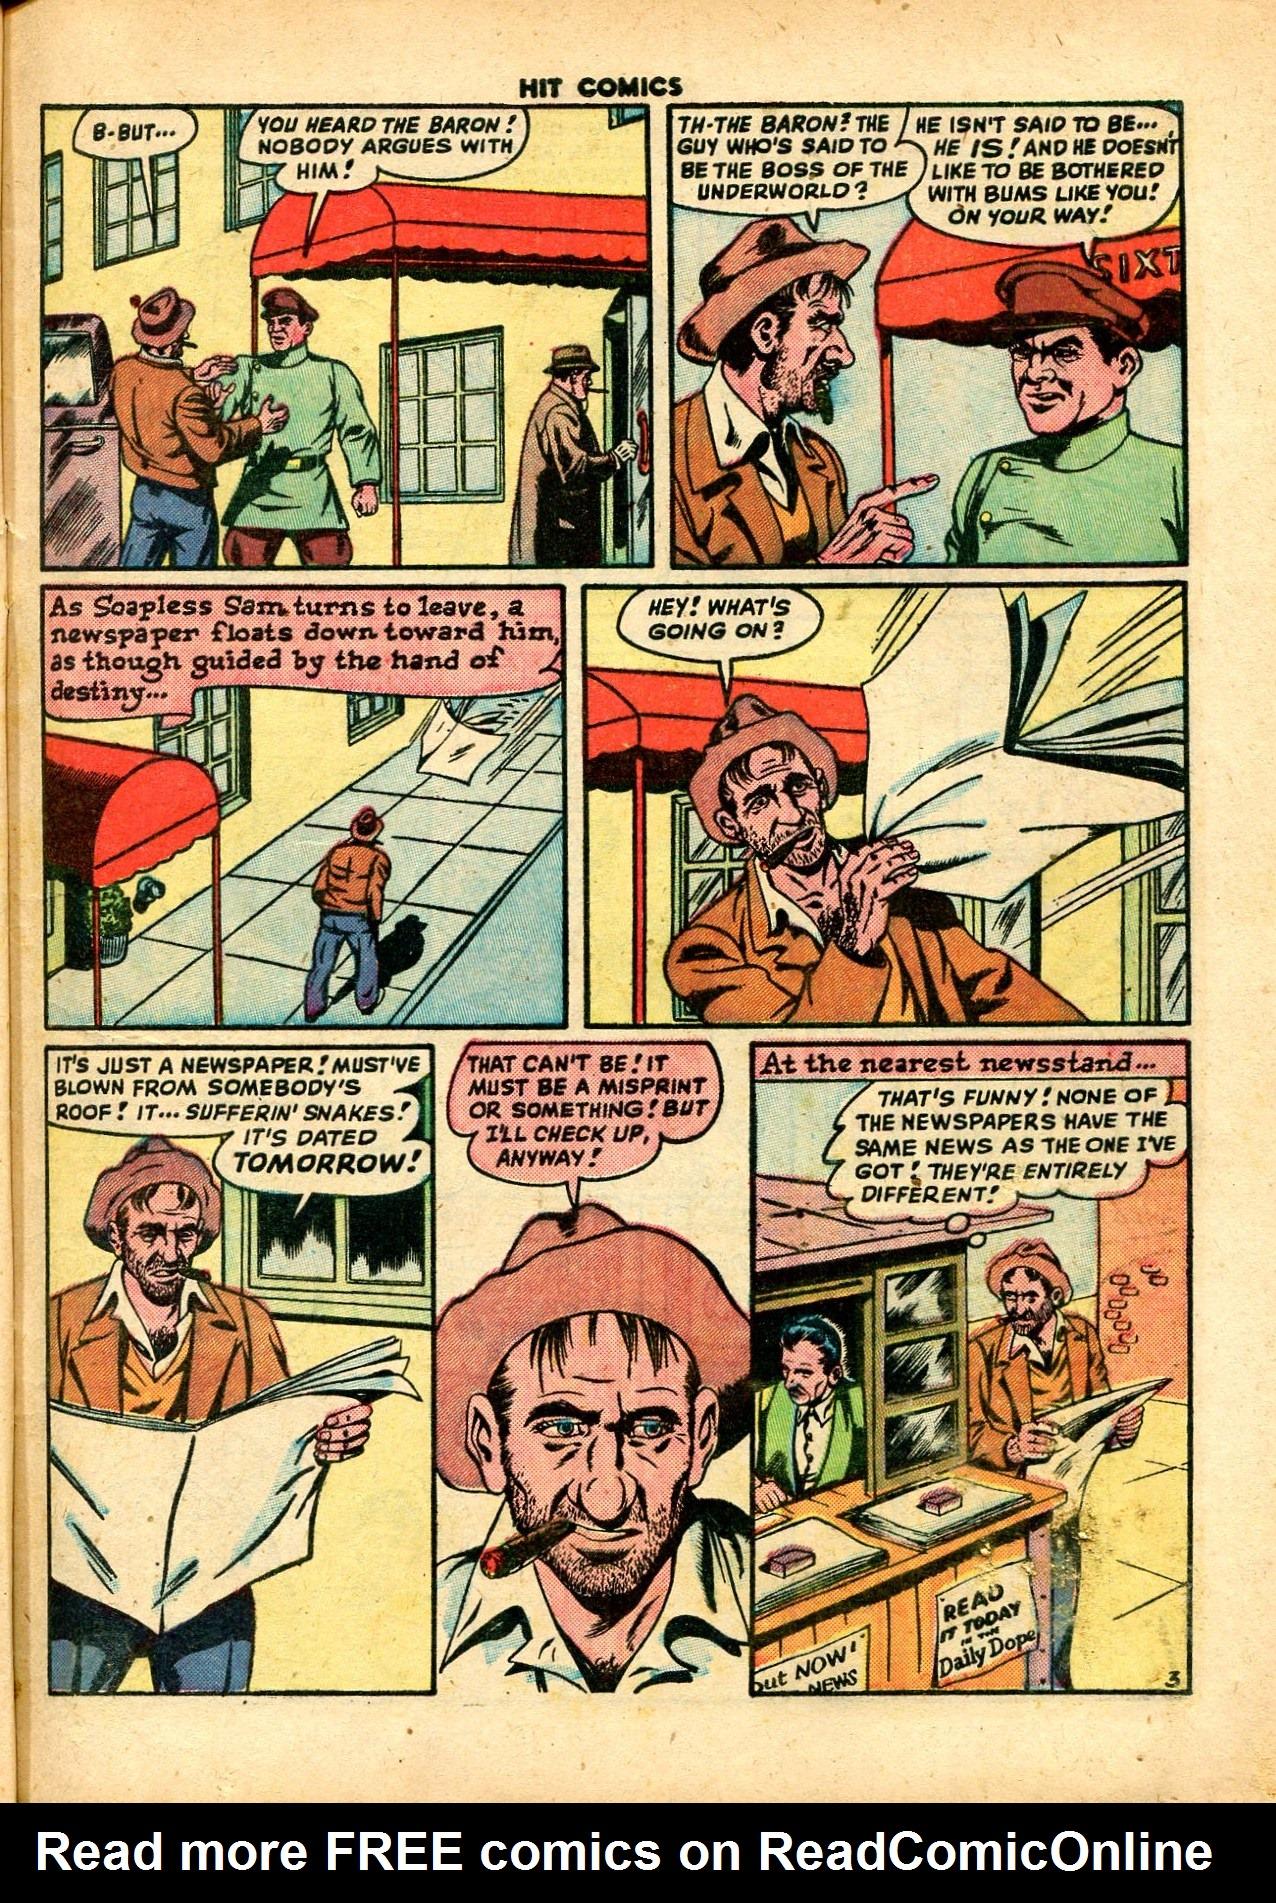 Read online Hit Comics comic -  Issue #59 - 5